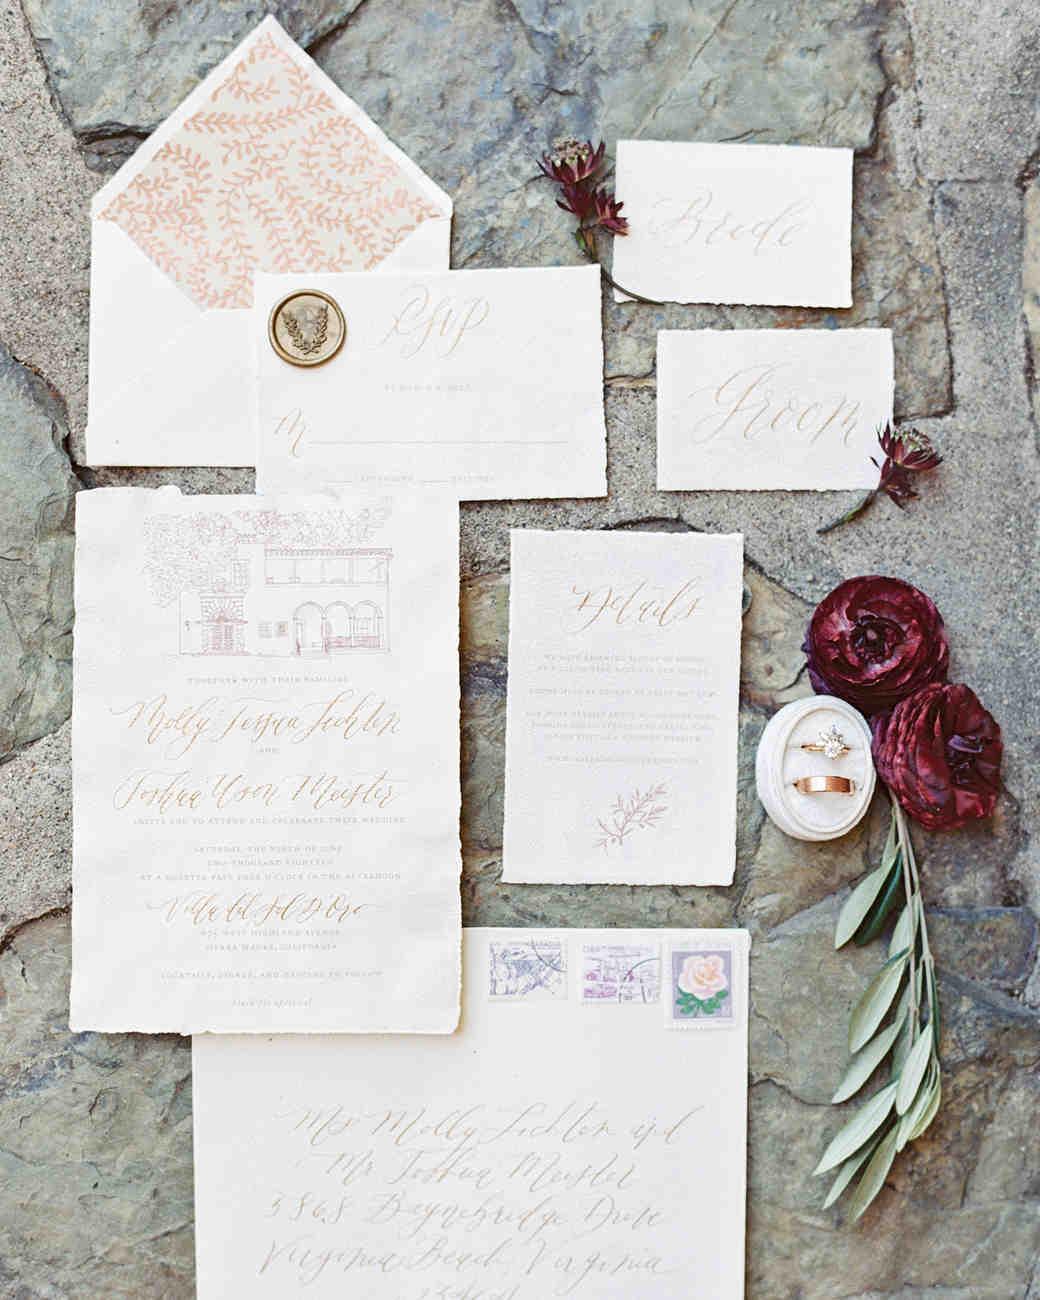 molly josh wedding invitations and stationary